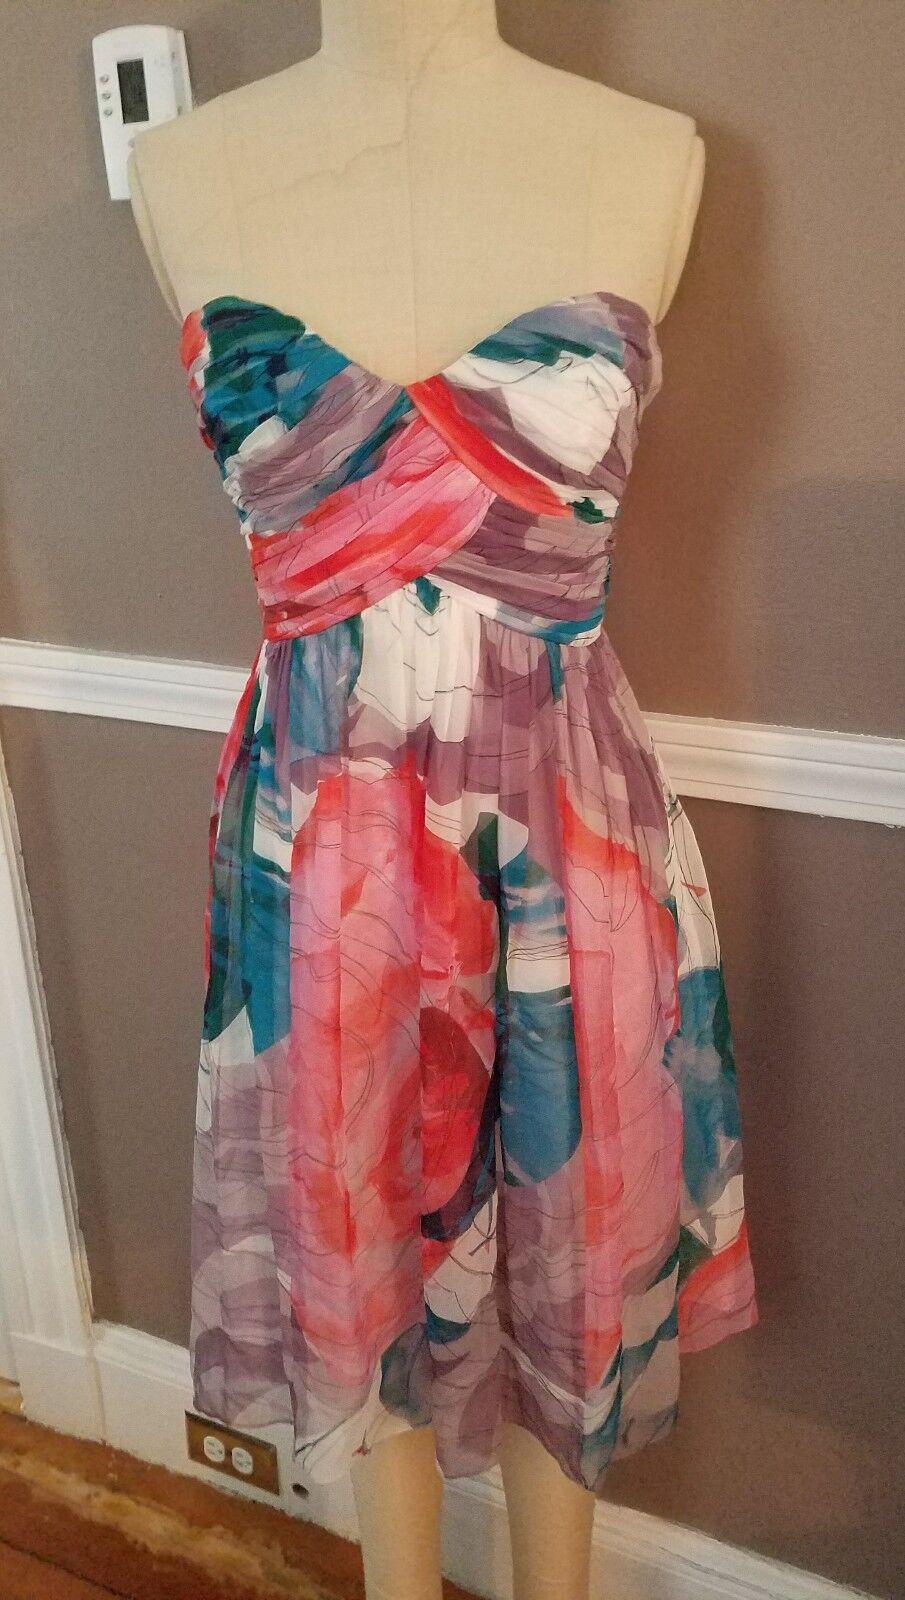 Stunning 100% Silk Strapless Multicolor Dress by women Morgan   Size 4